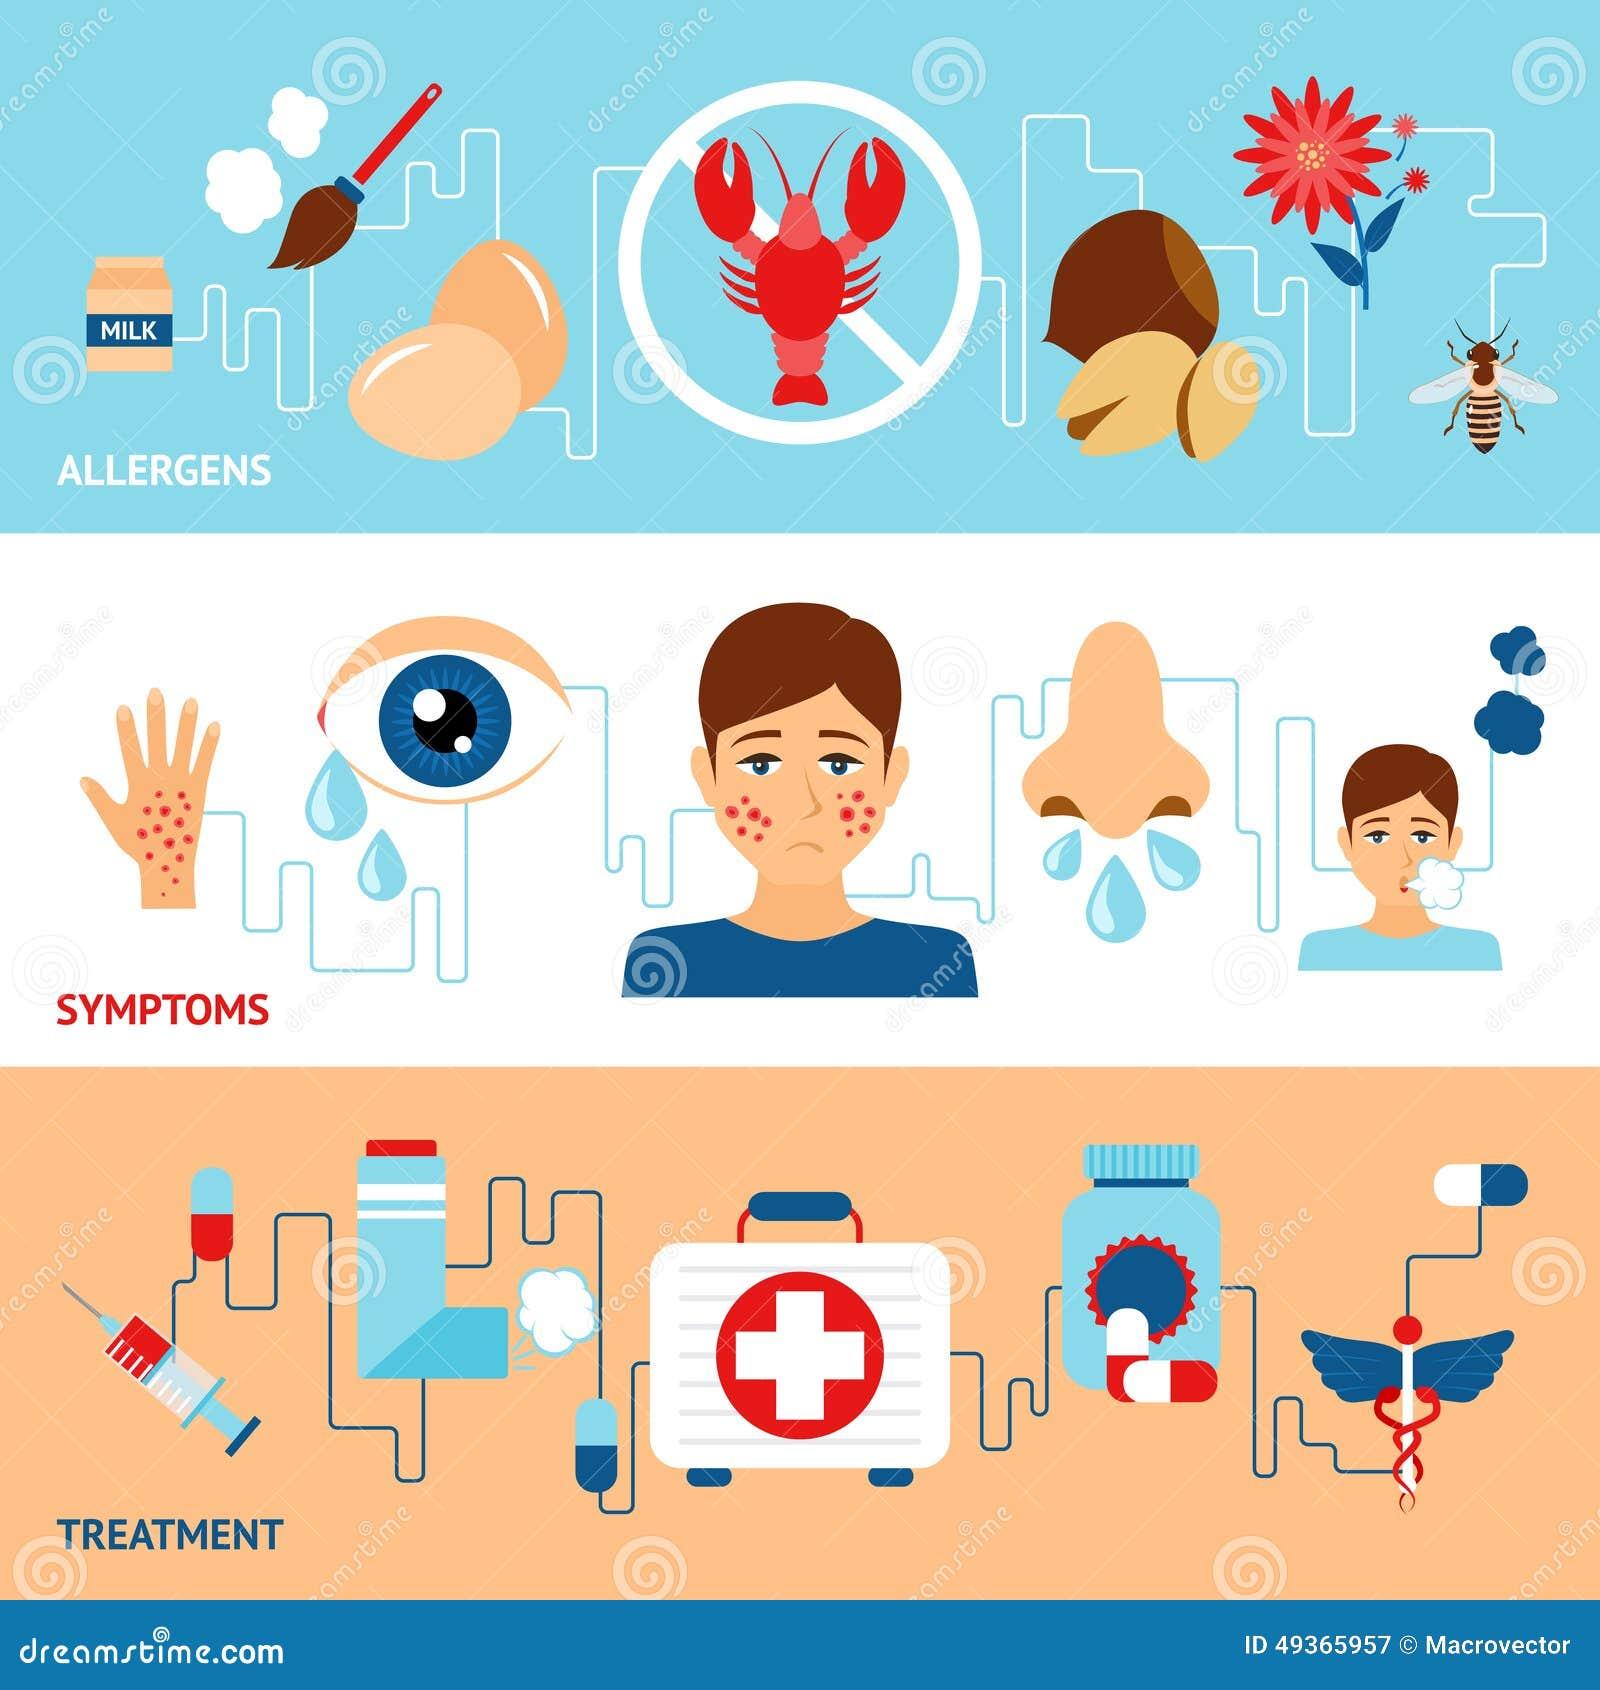 download Fundamentals of medical imaging